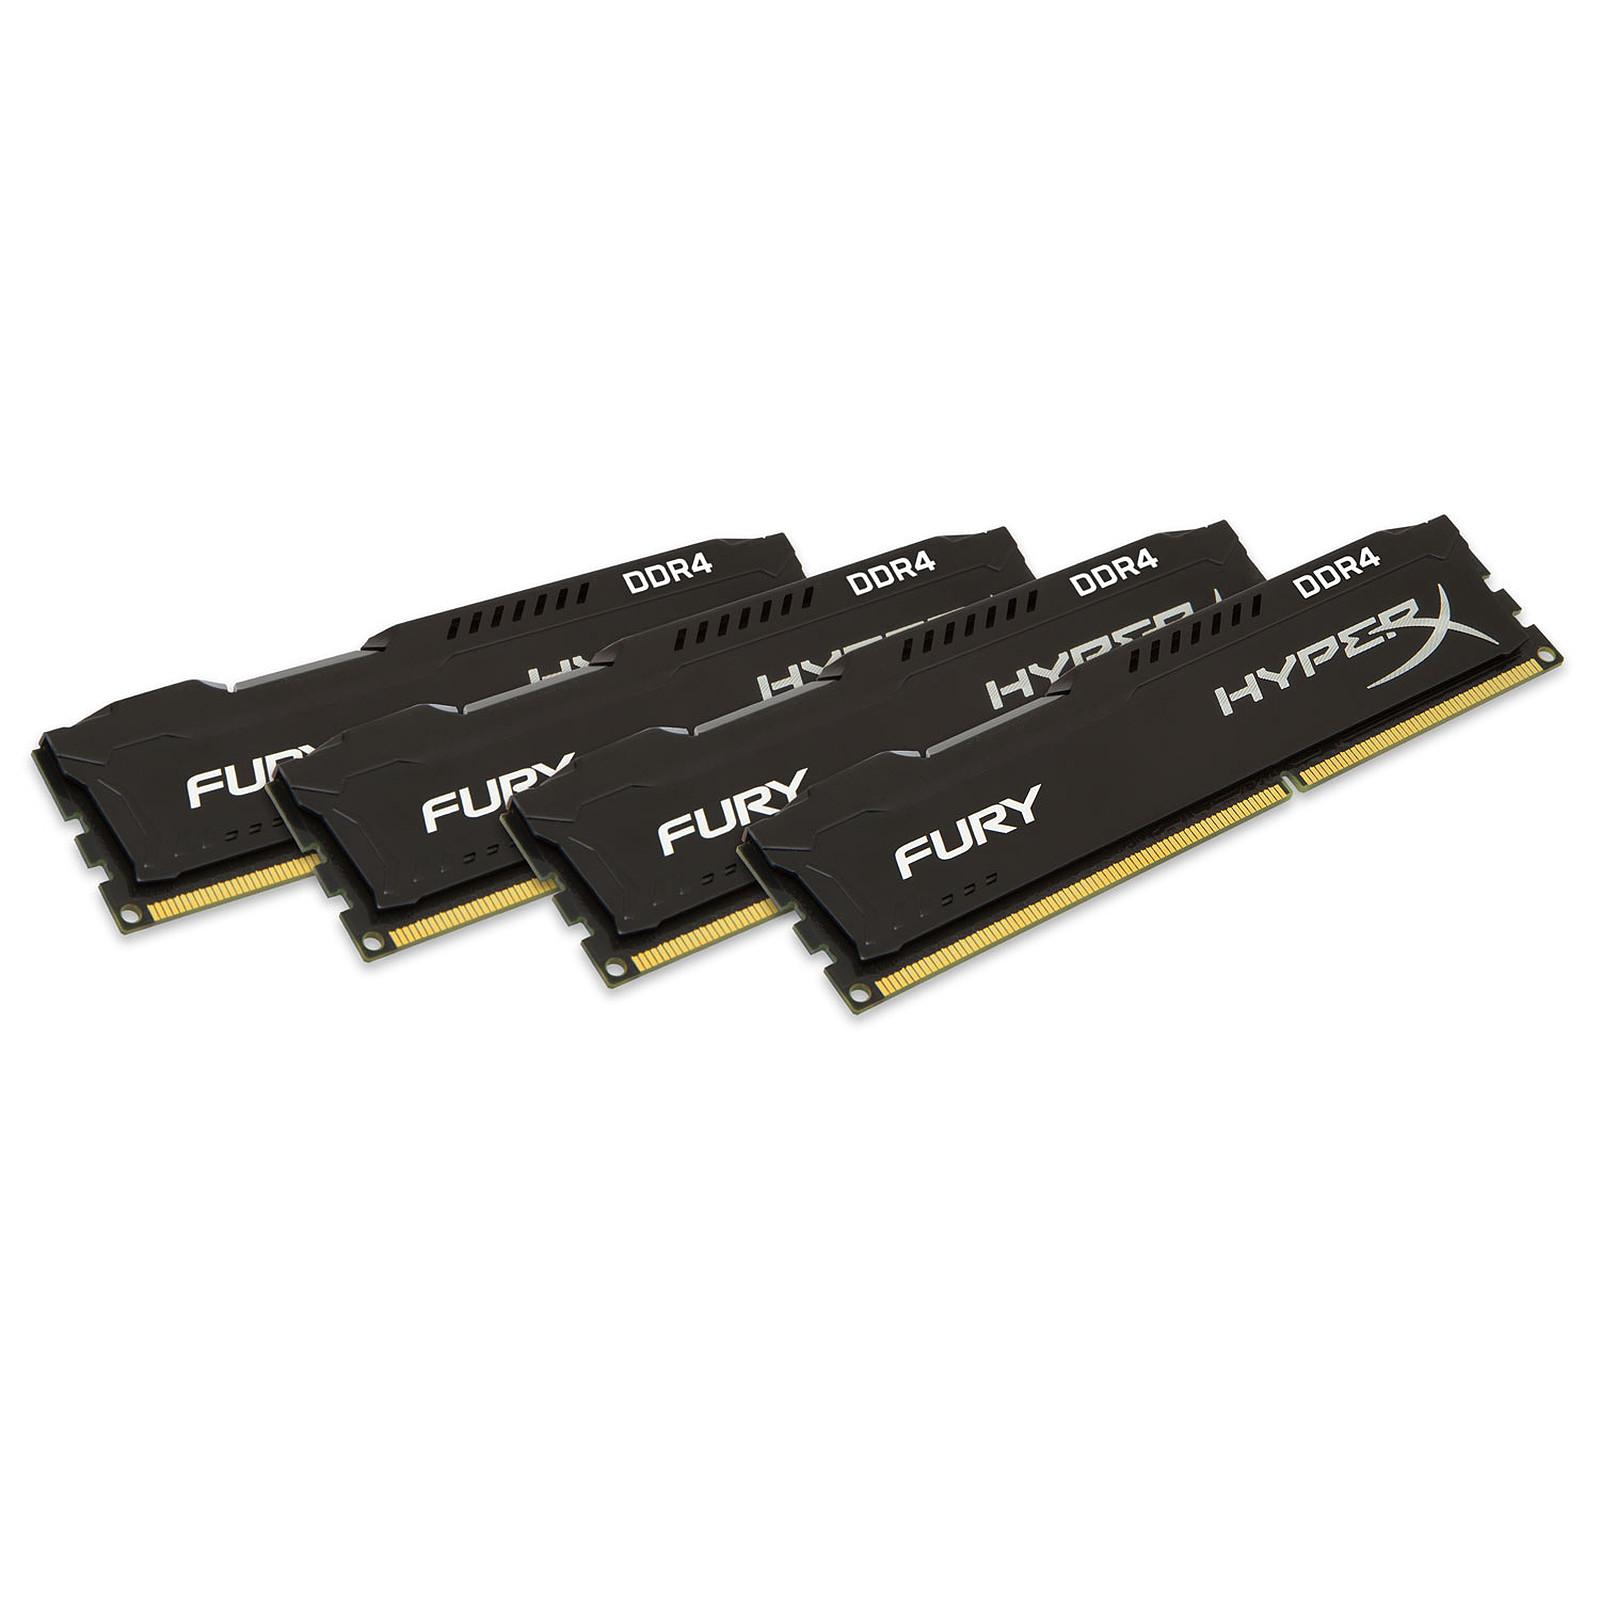 HyperX Fury Noir 32 Go (4x 8 Go) DDR4 2666 MHz CL16